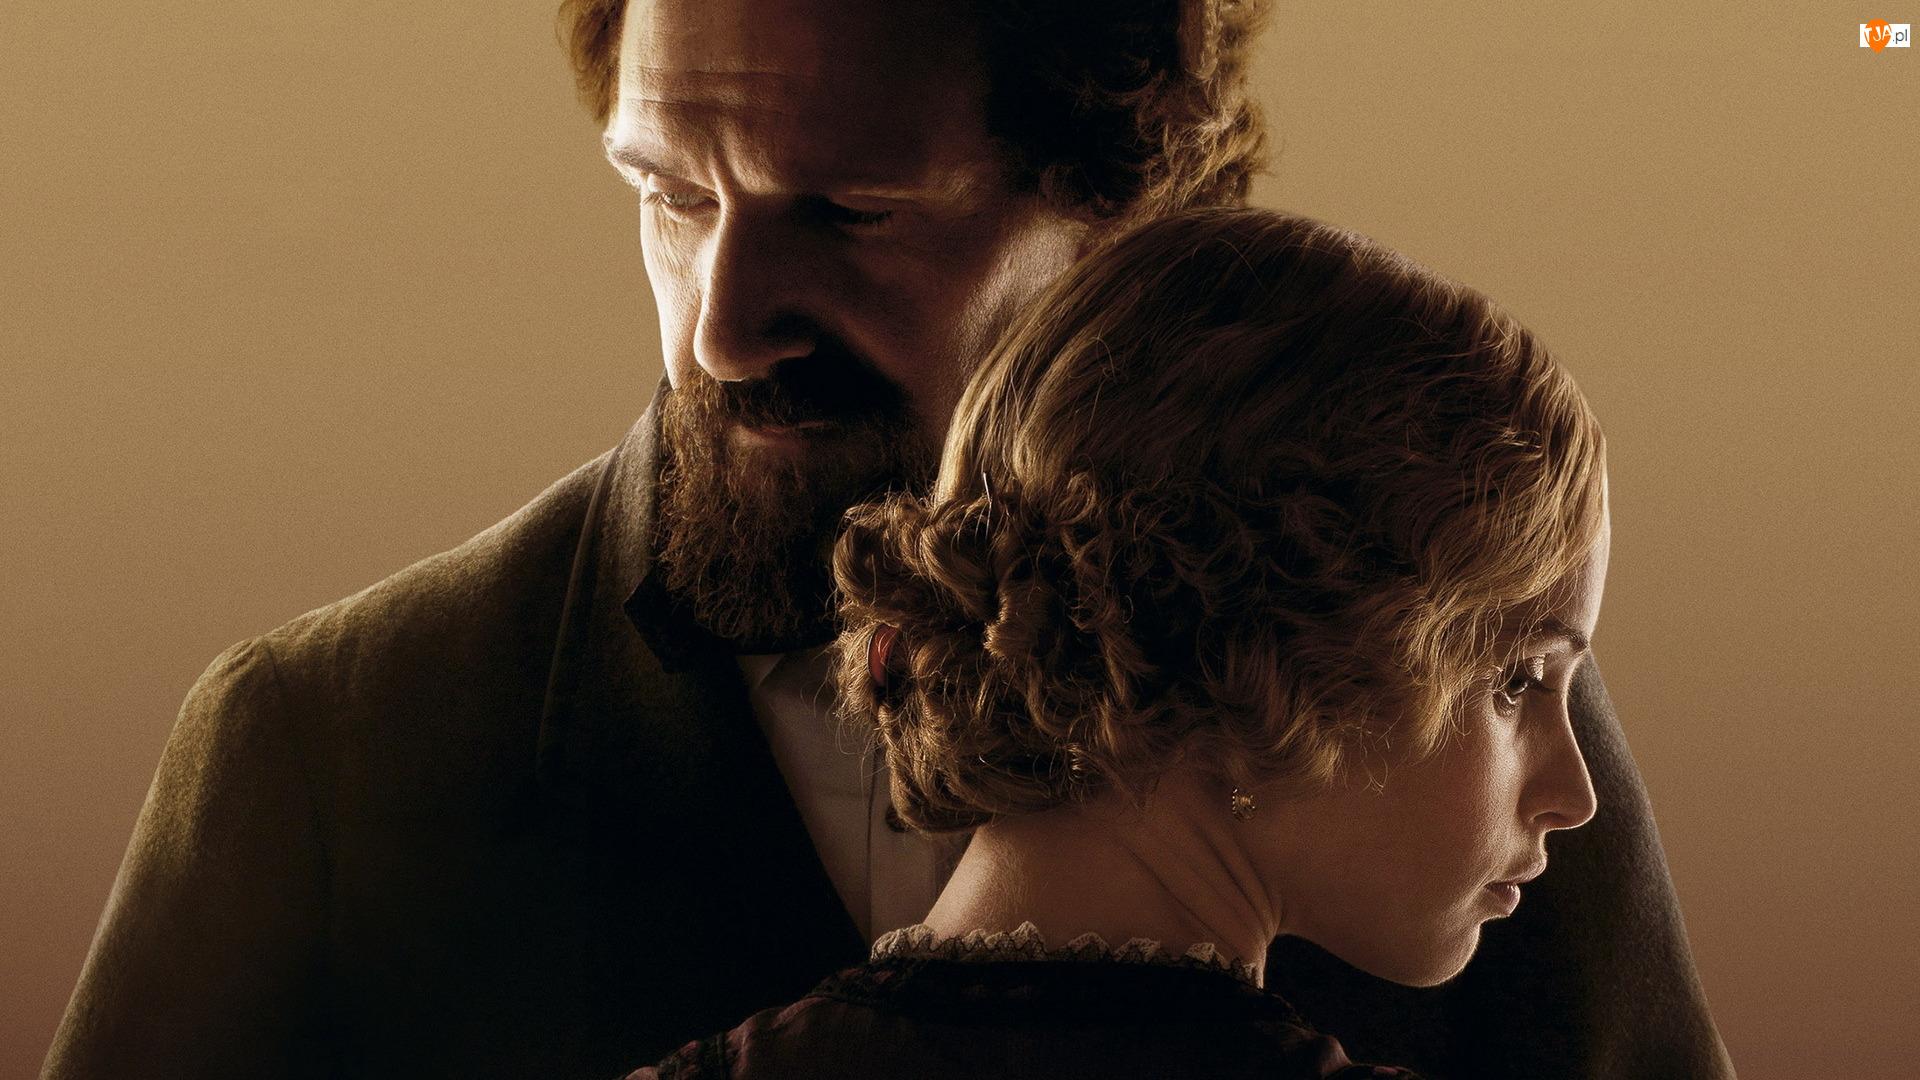 Kobieta w ukryciu, The Invisible Woman, Ralph Fiennes, Film, Aktor, Felicity Jones, Aktorka